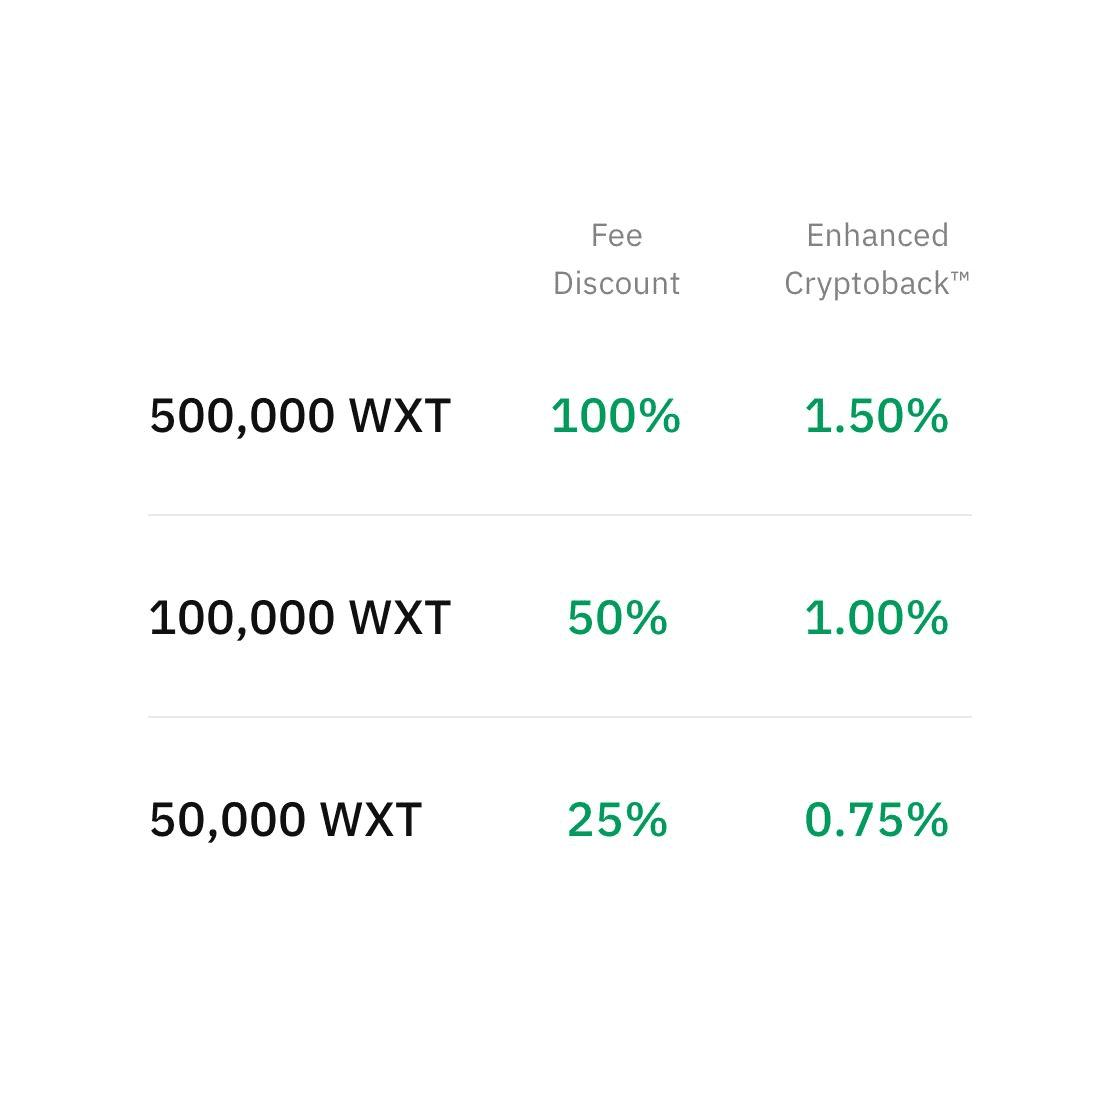 WXT crypto Fee discount & enhanced rewards - wirex